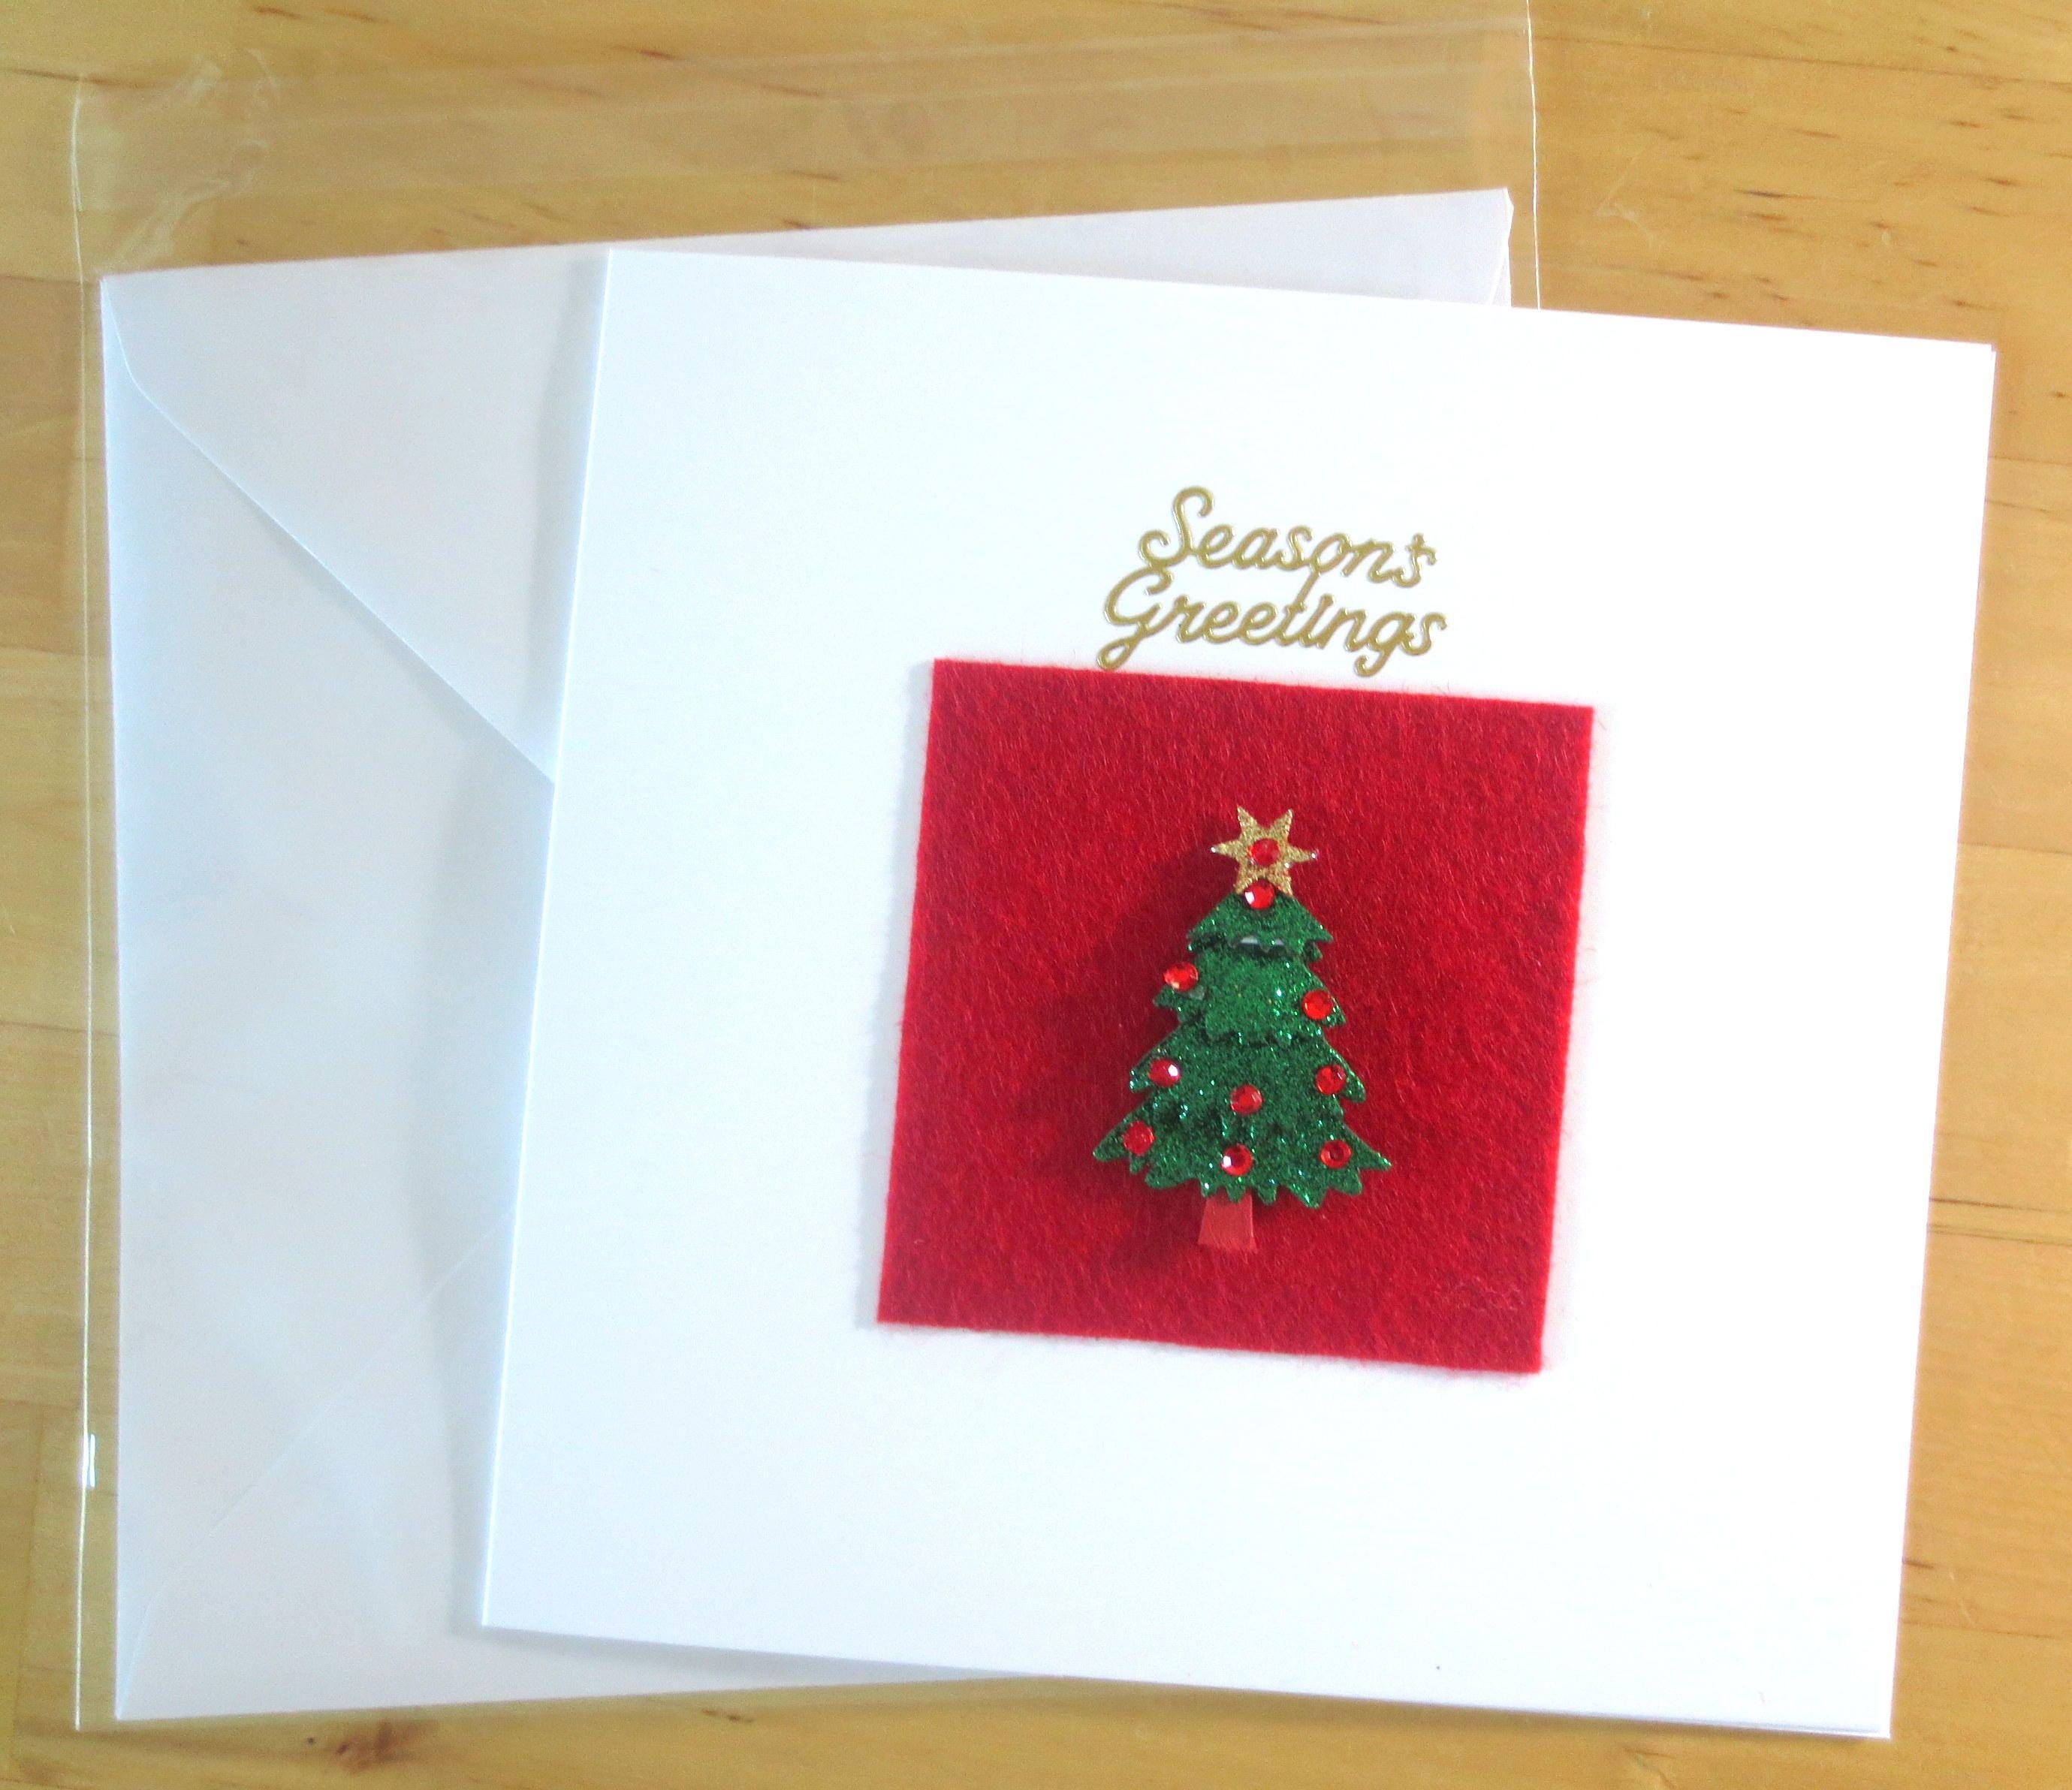 Card Xmas Greetings Card Seasons Greetings Card Xmas Cards